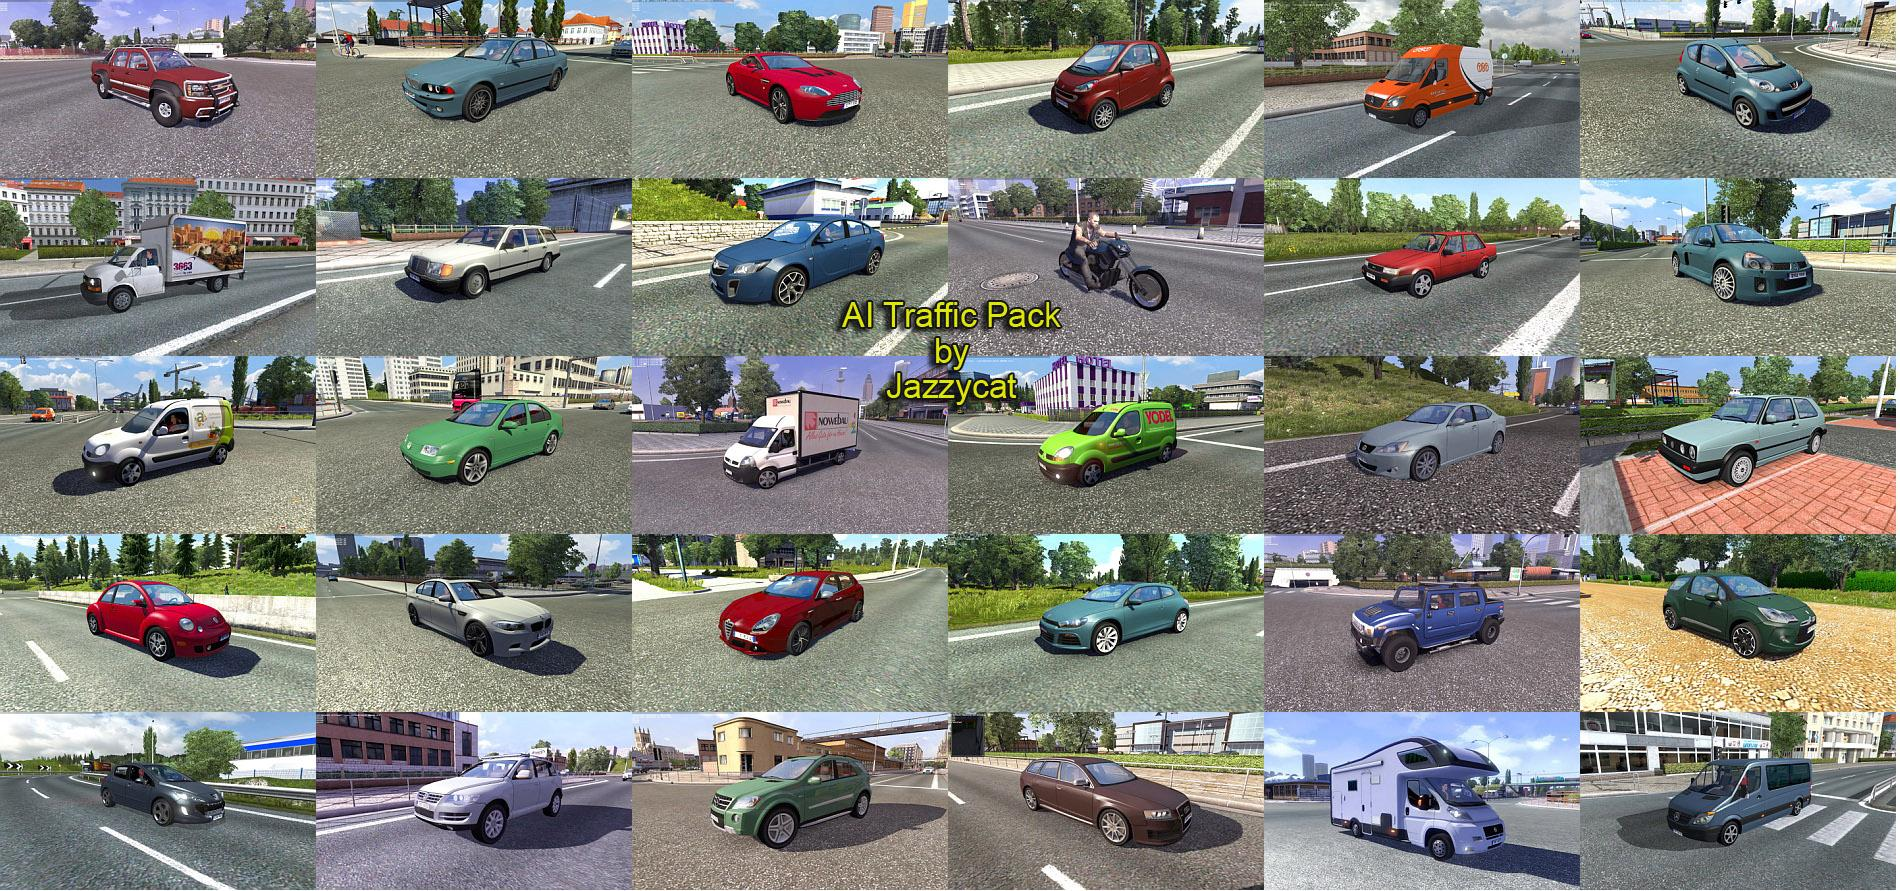 AI Traffic Pack by Jazzycat v2 1 - Modhub us